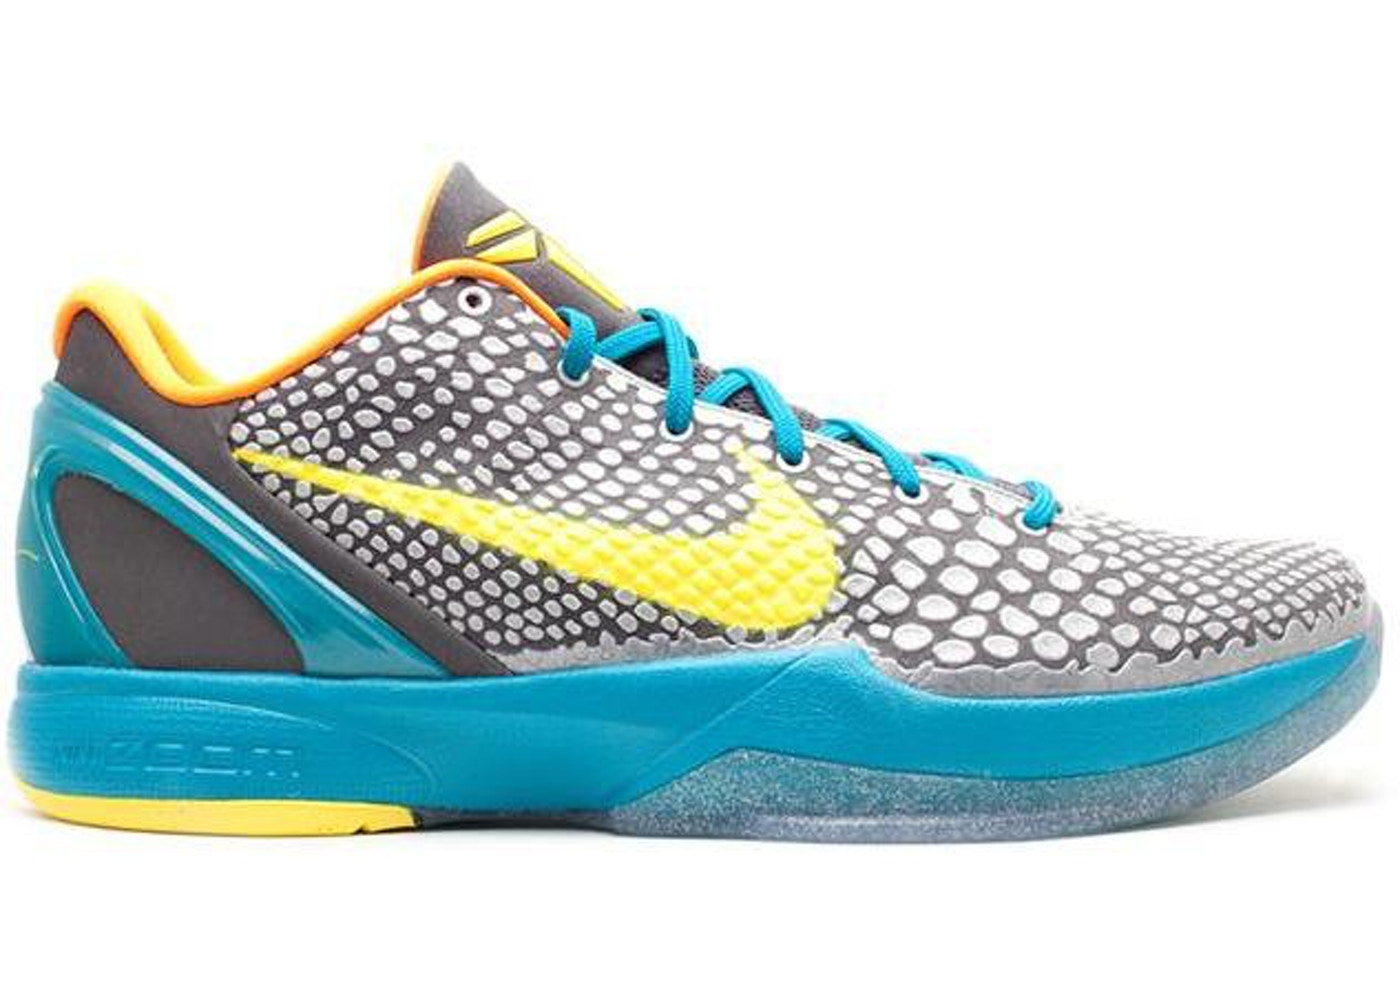 Buy Nike Kobe 6 Shoes & Deadstock Sneakers